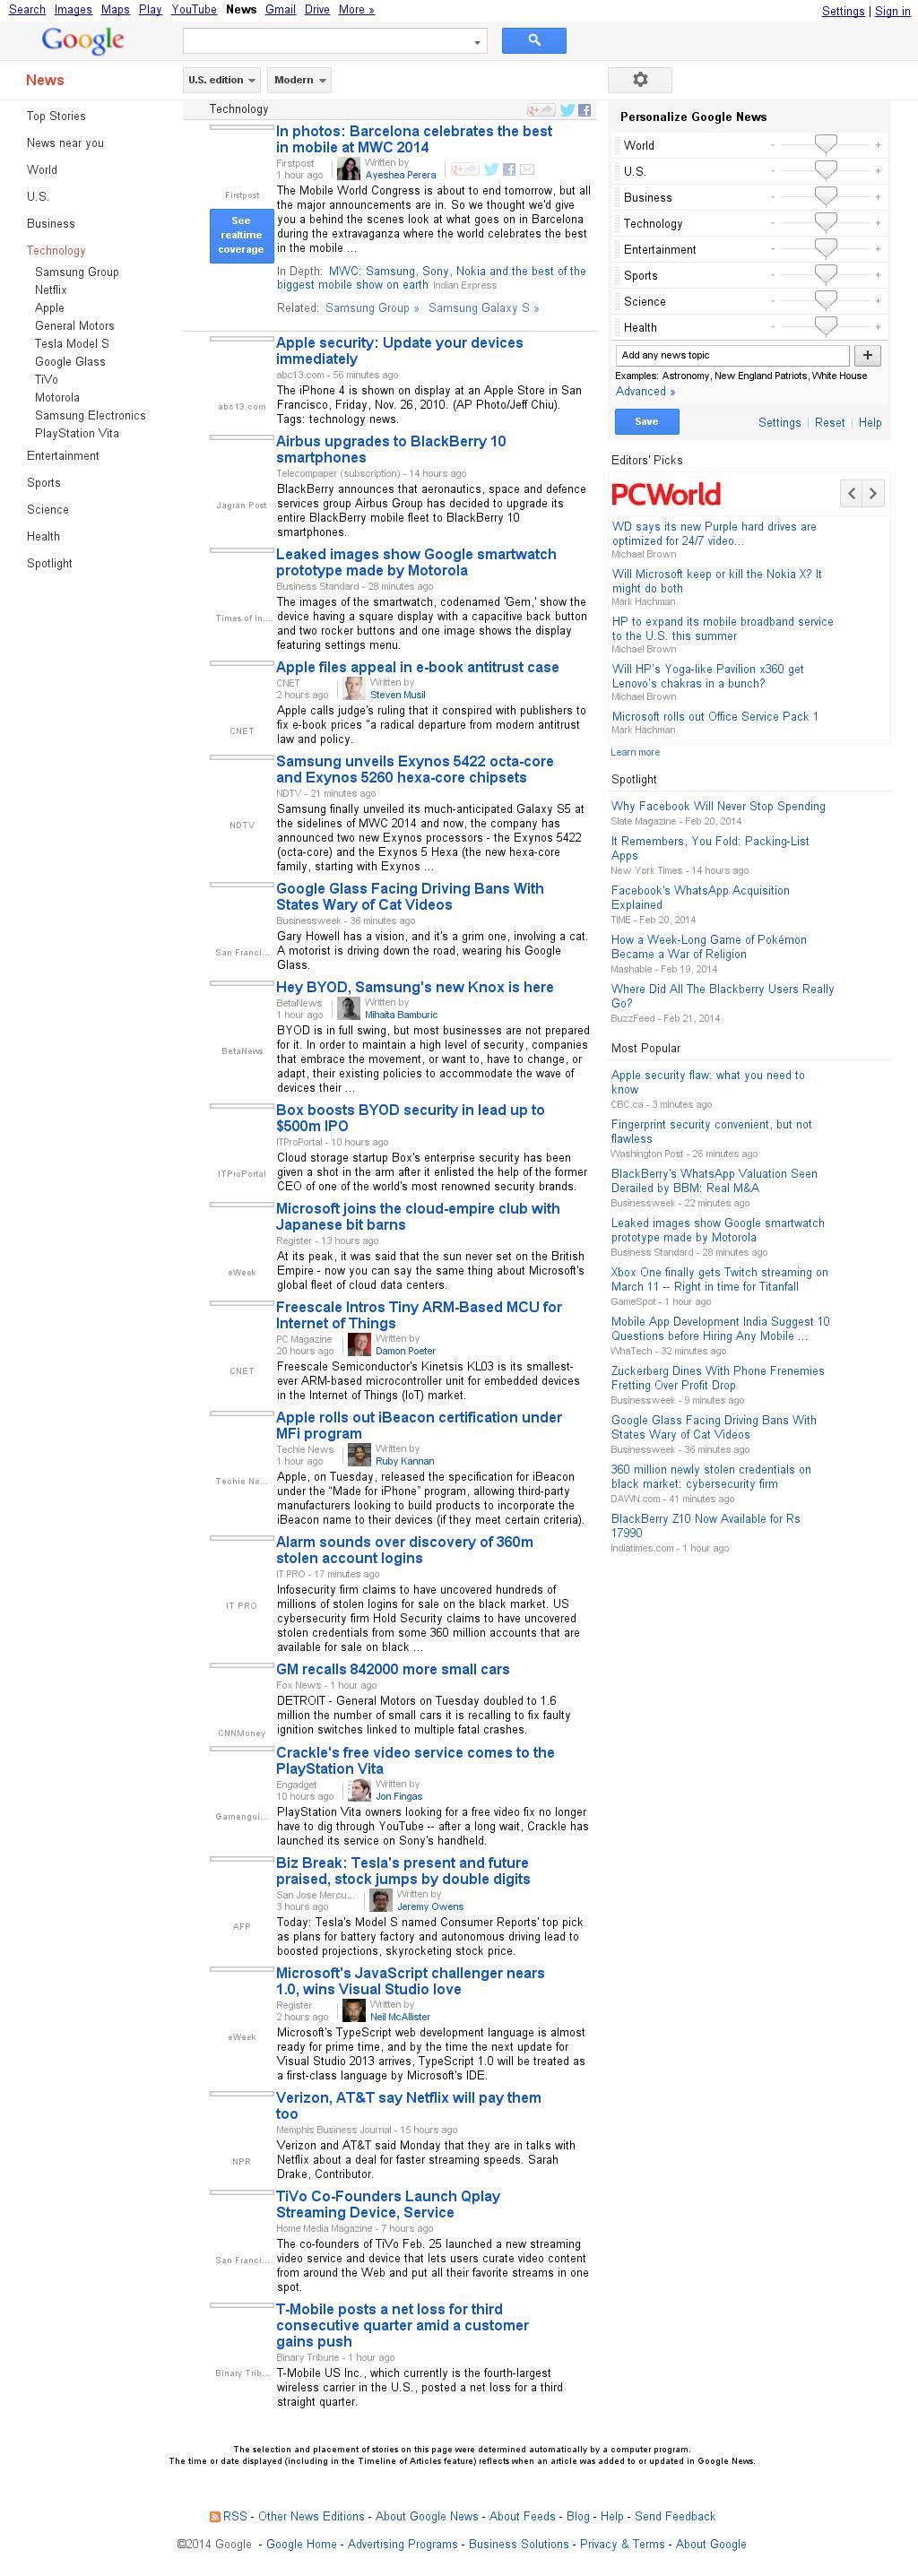 Google News: Technology at Wednesday Feb. 26, 2014, 10:08 a.m. UTC